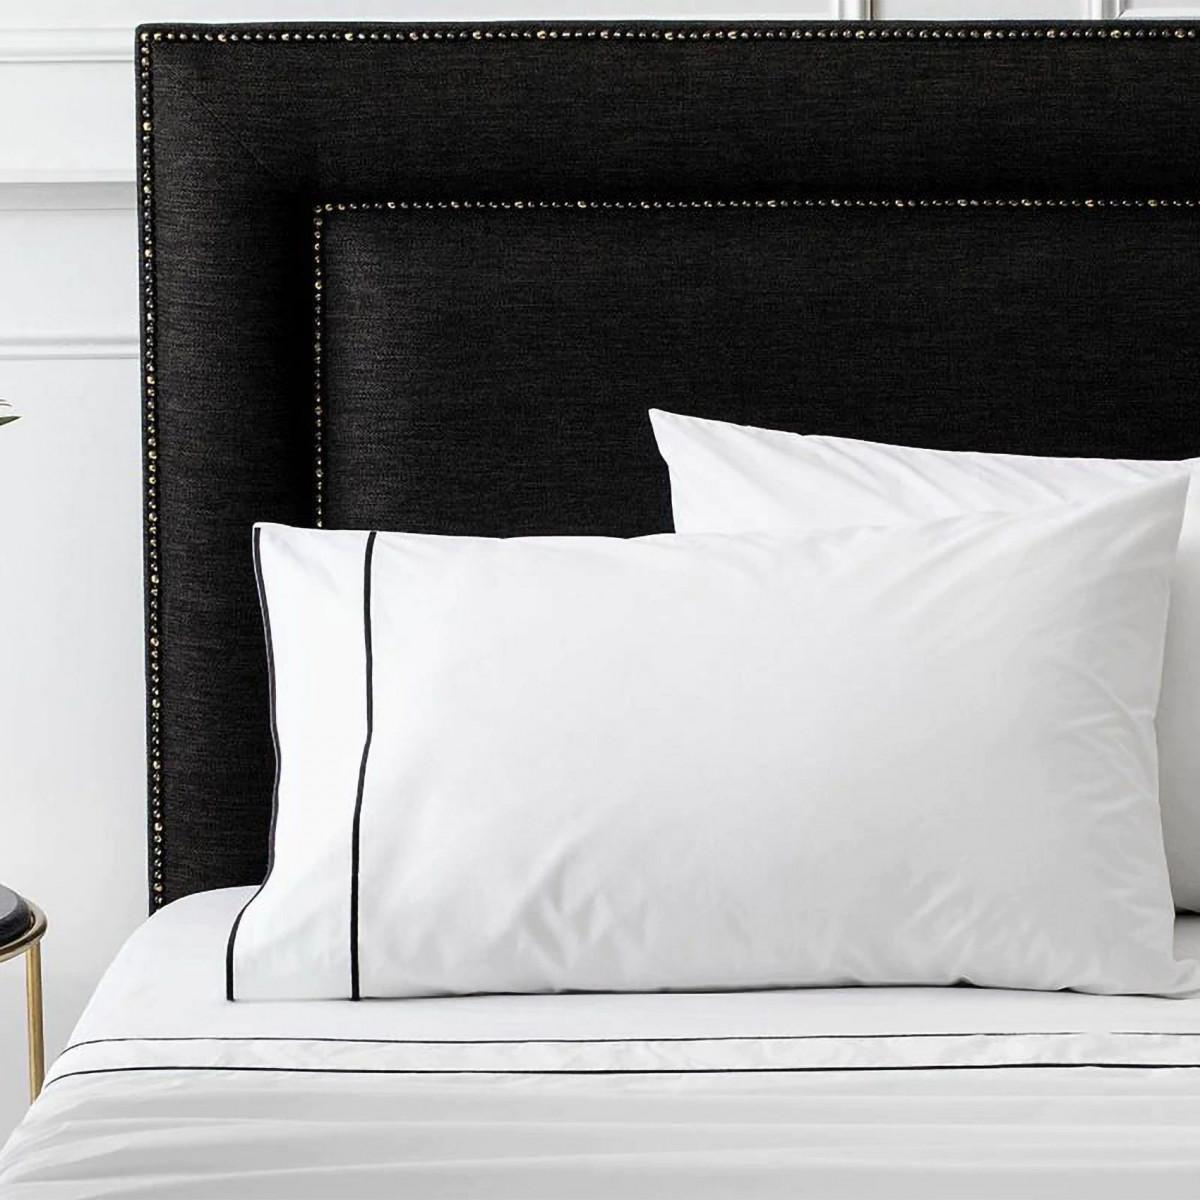 SHERIDAN CORLETTE 床单套装